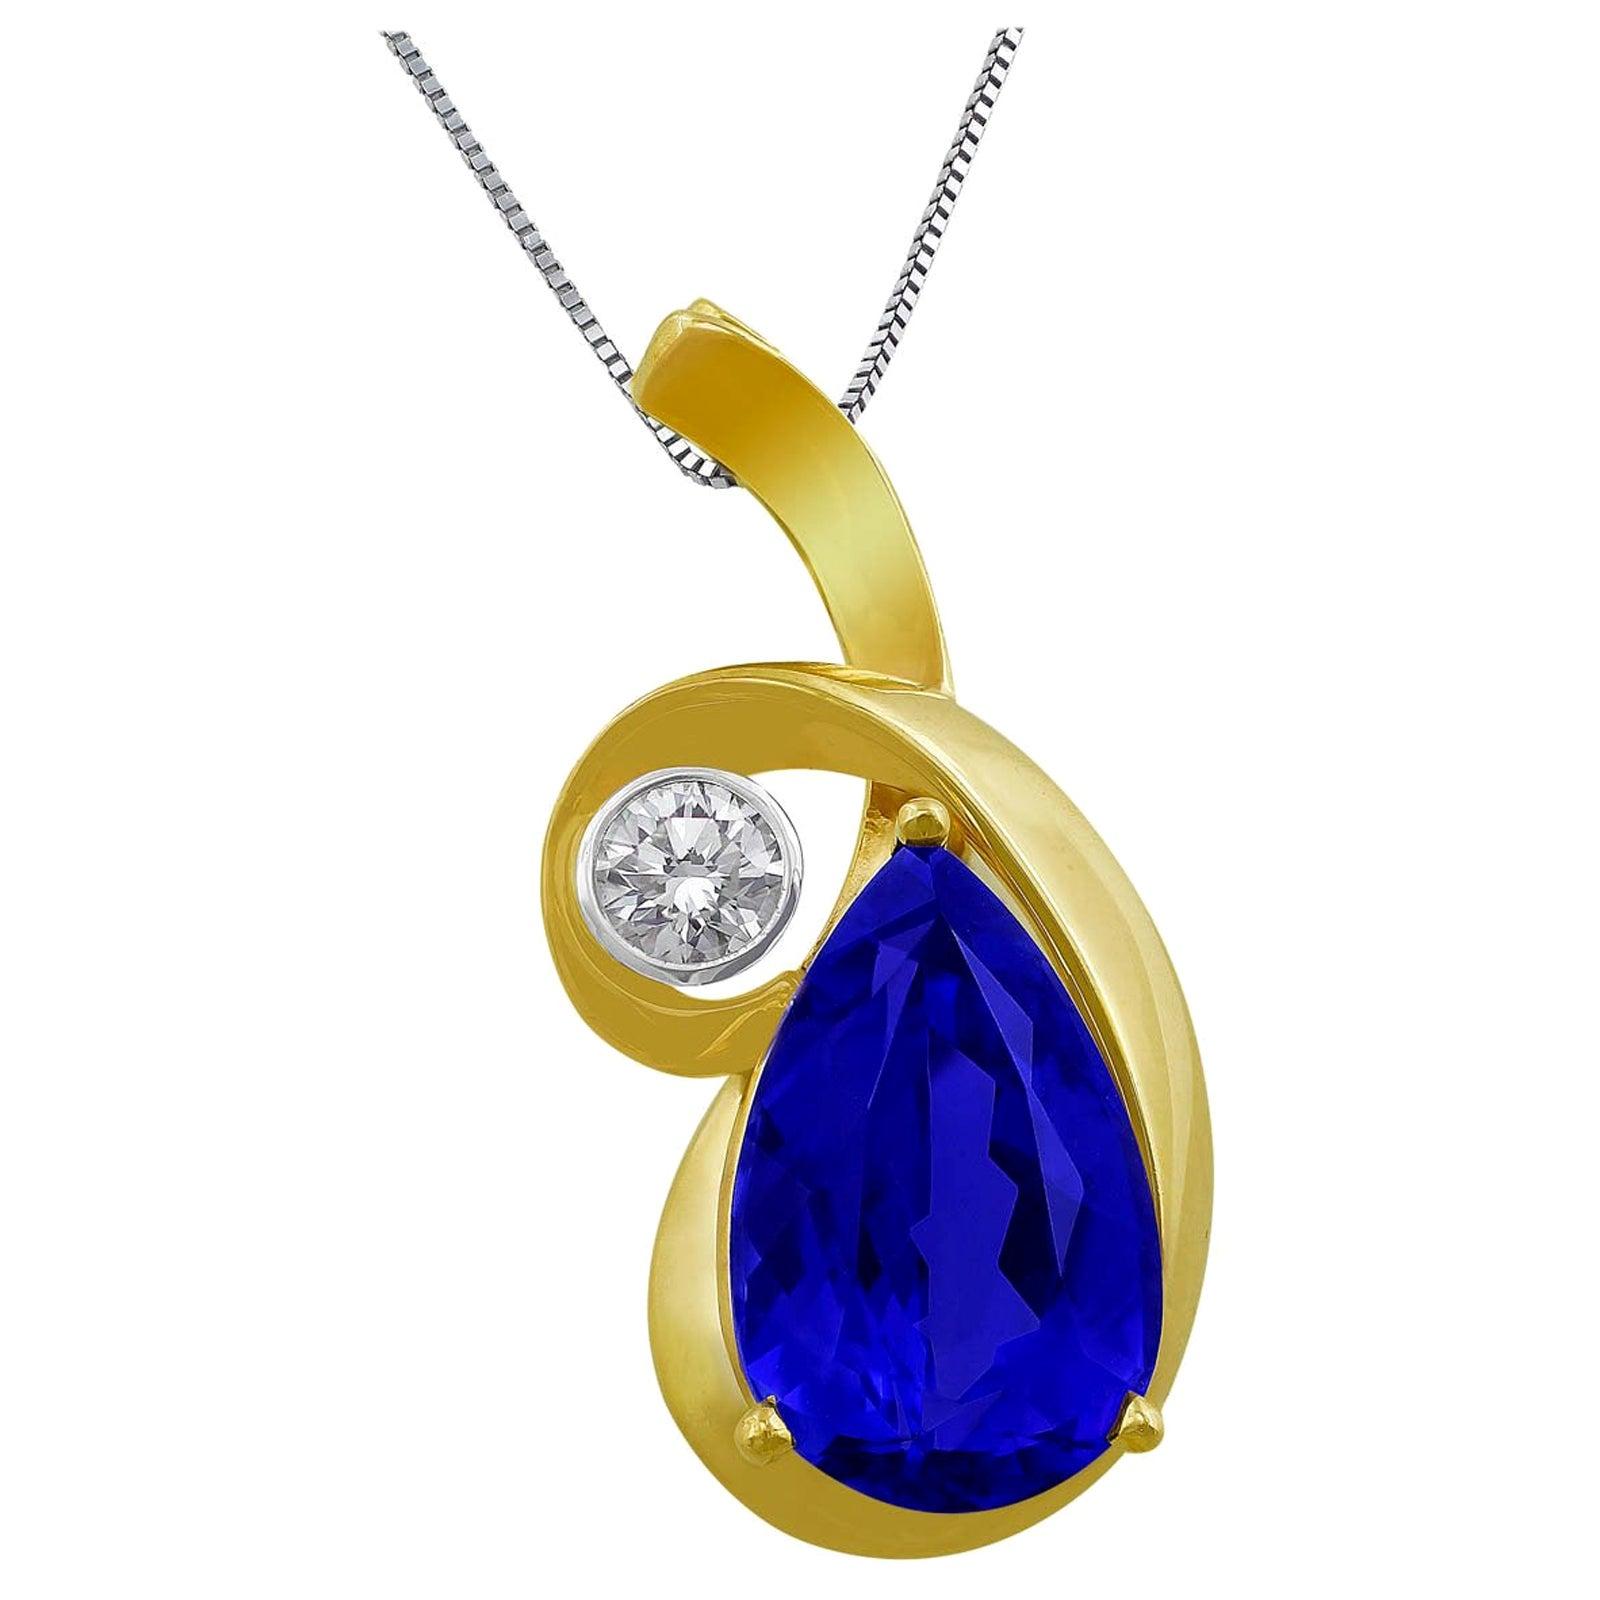 14 Karat Yellow Gold Tanzanite Pendant Necklace